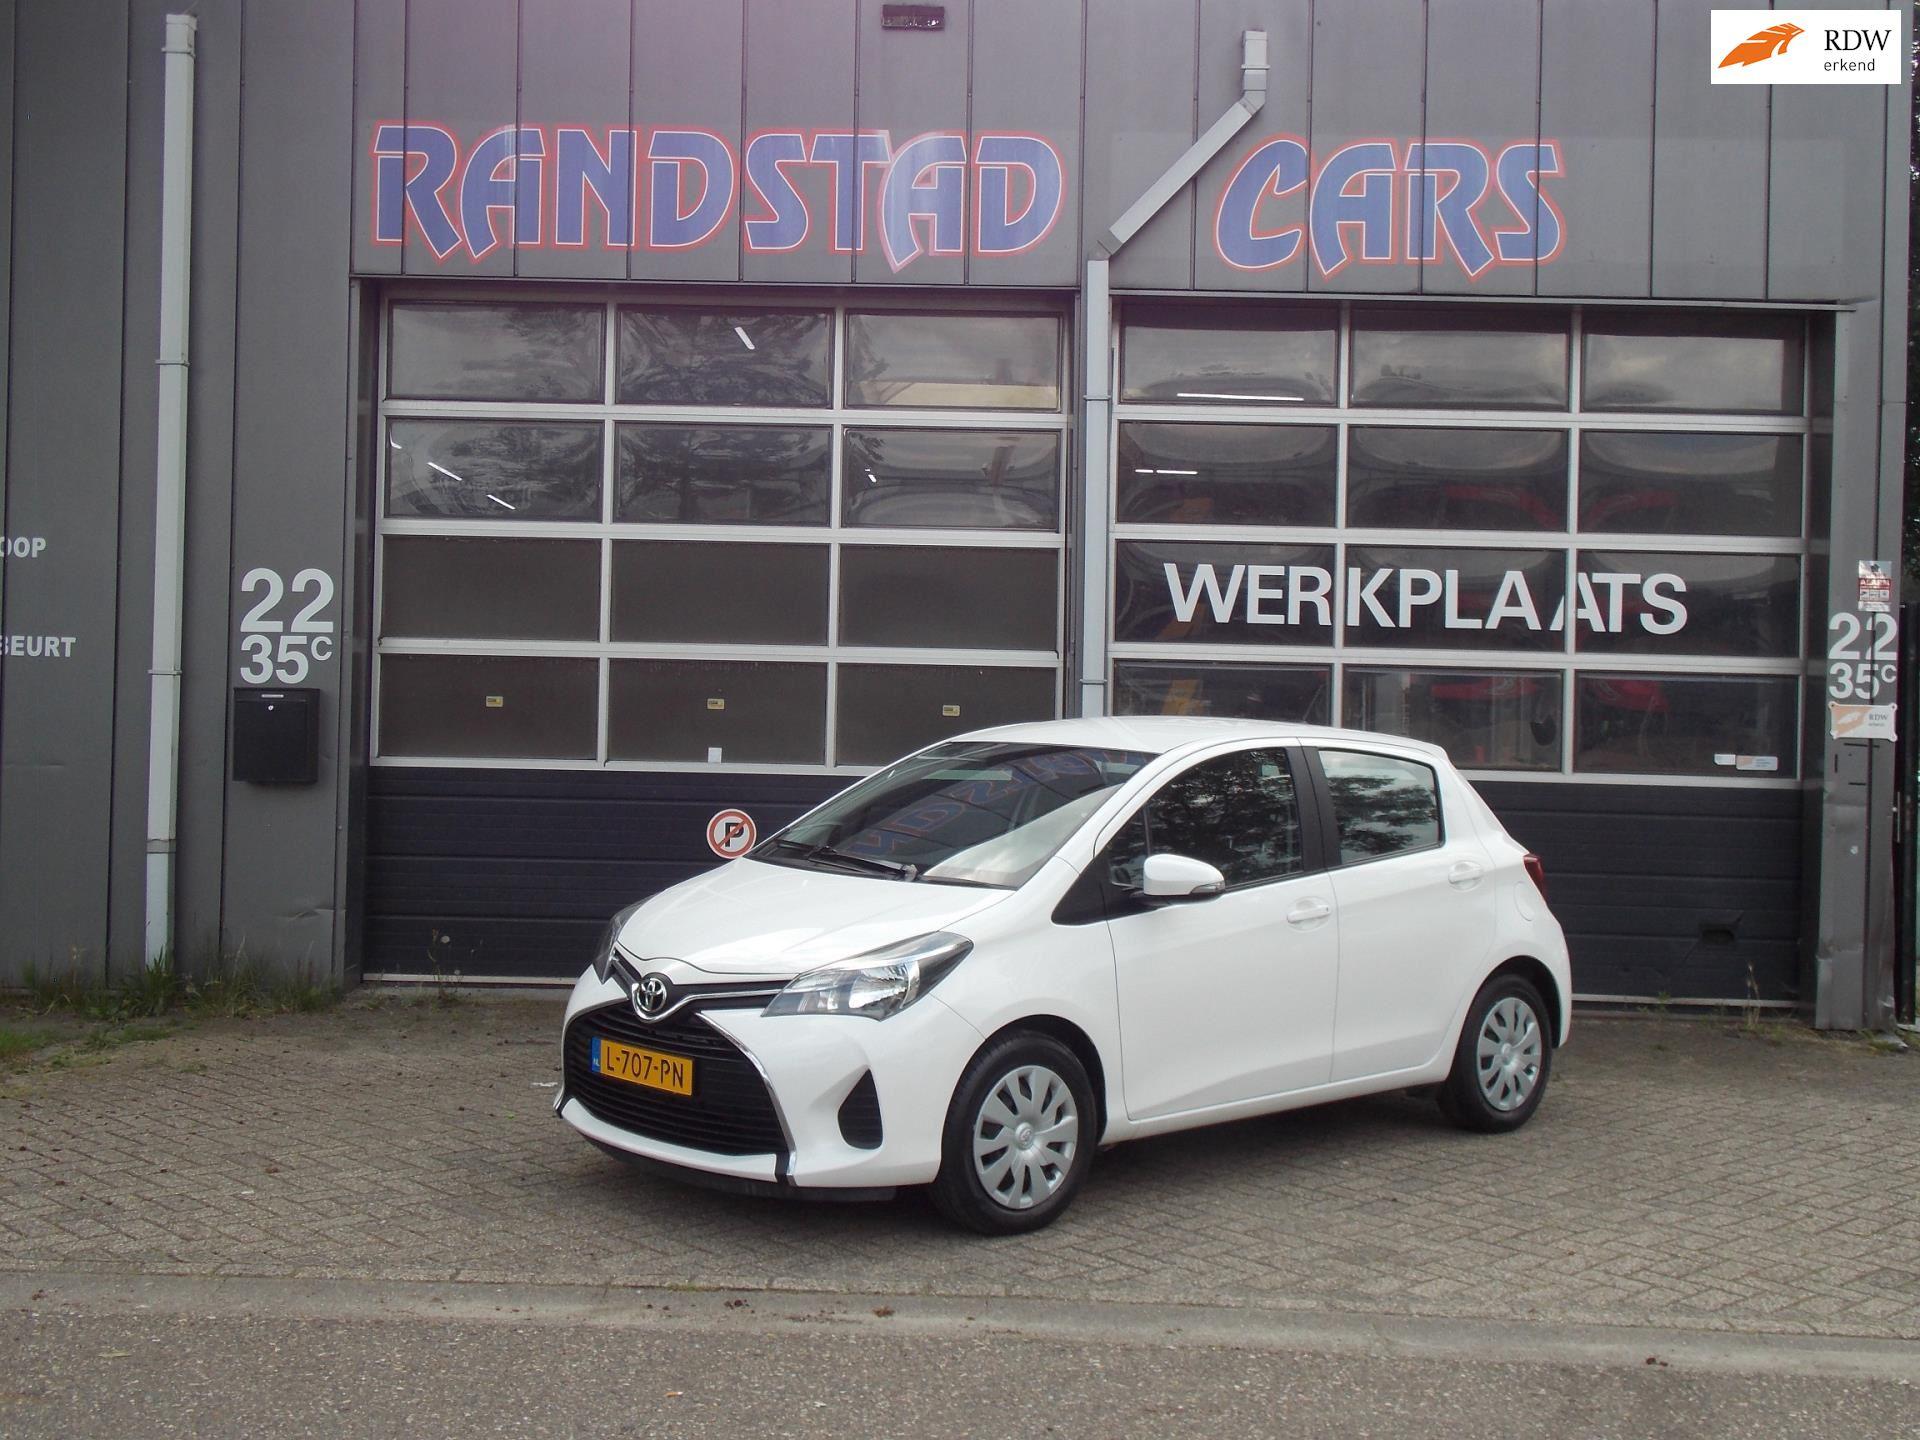 Toyota Yaris occasion - Randstad Cars